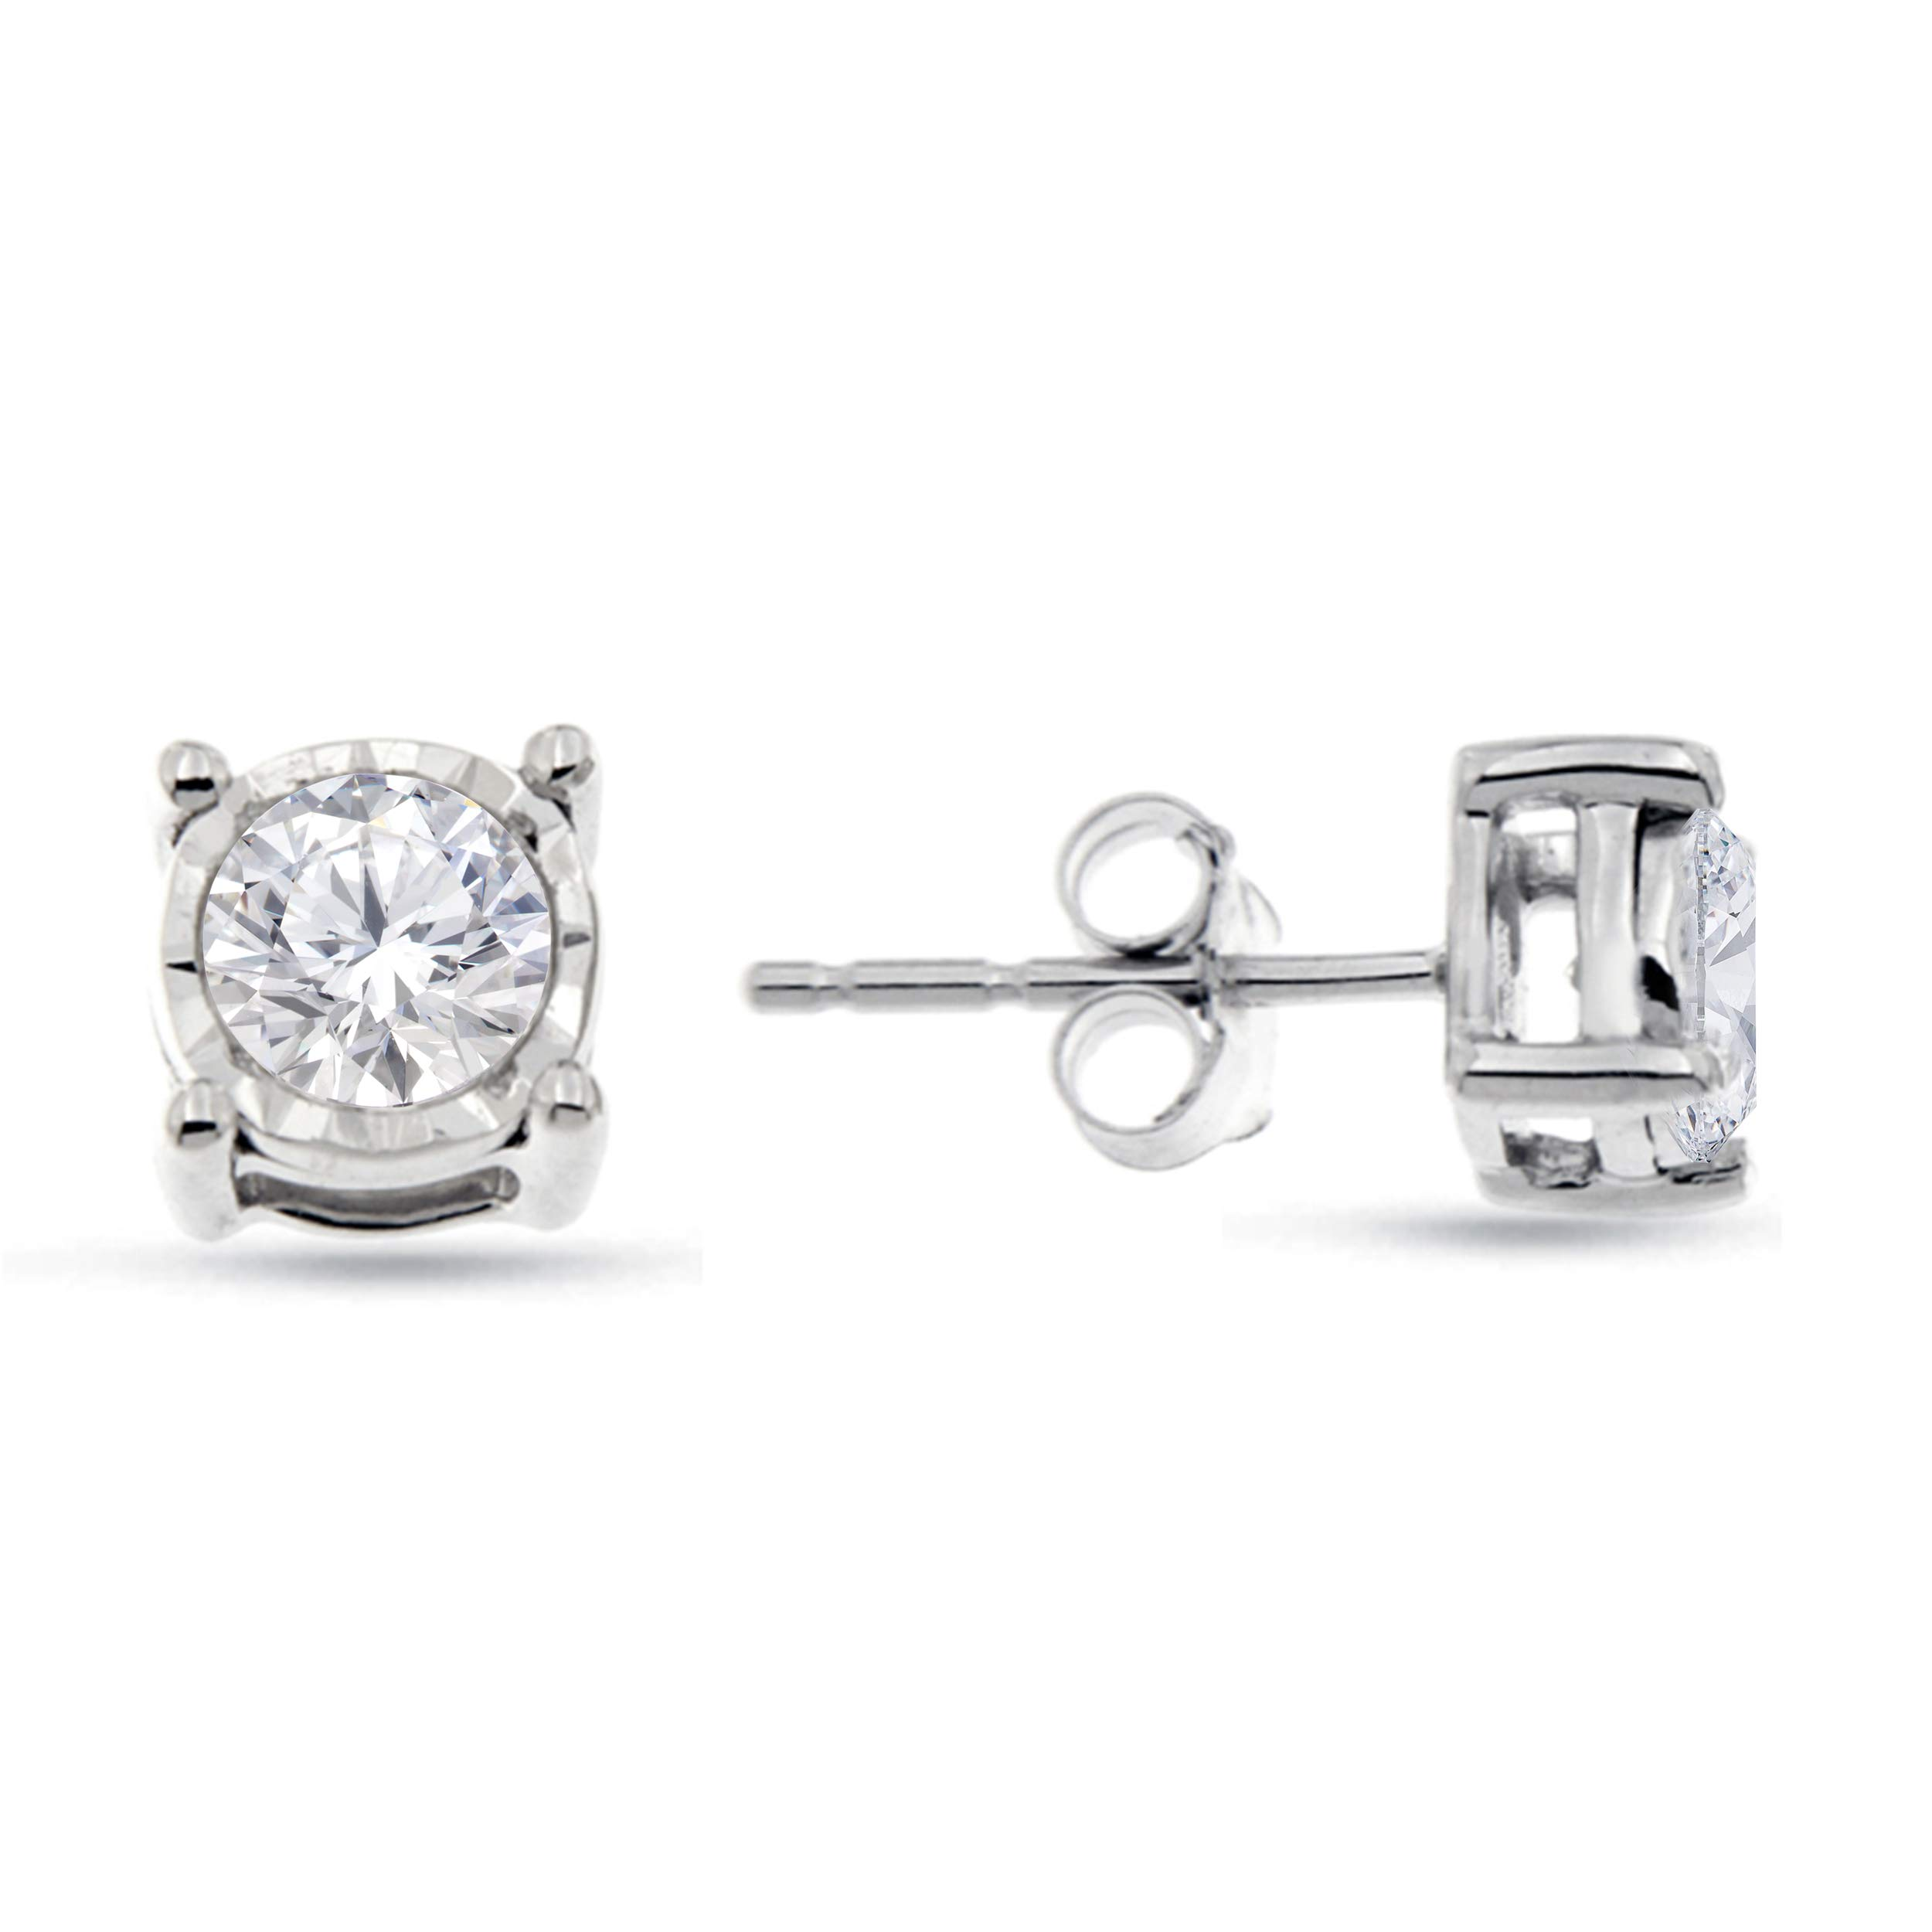 Natalia Drake Sterling Silver Miraculous Diamond Stud Halo Earrings (.50ctw, H-I Color, I1-i2 Clarity)